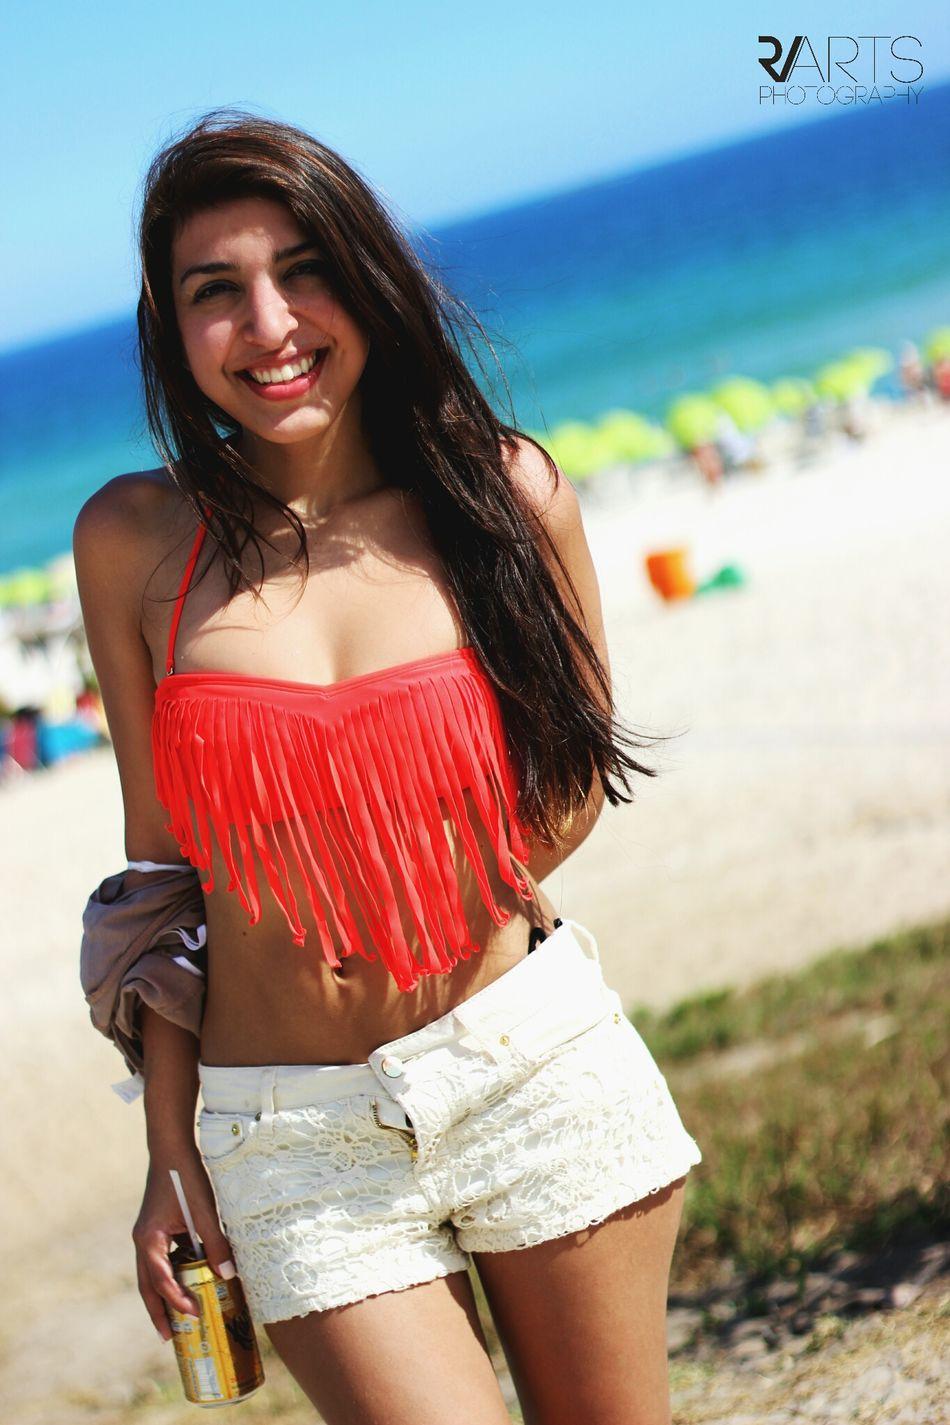 Everyday Joy Feeling Lucky Love Chilling Beach Life Summer ☀ Enjoying Her My Girlfriend <3